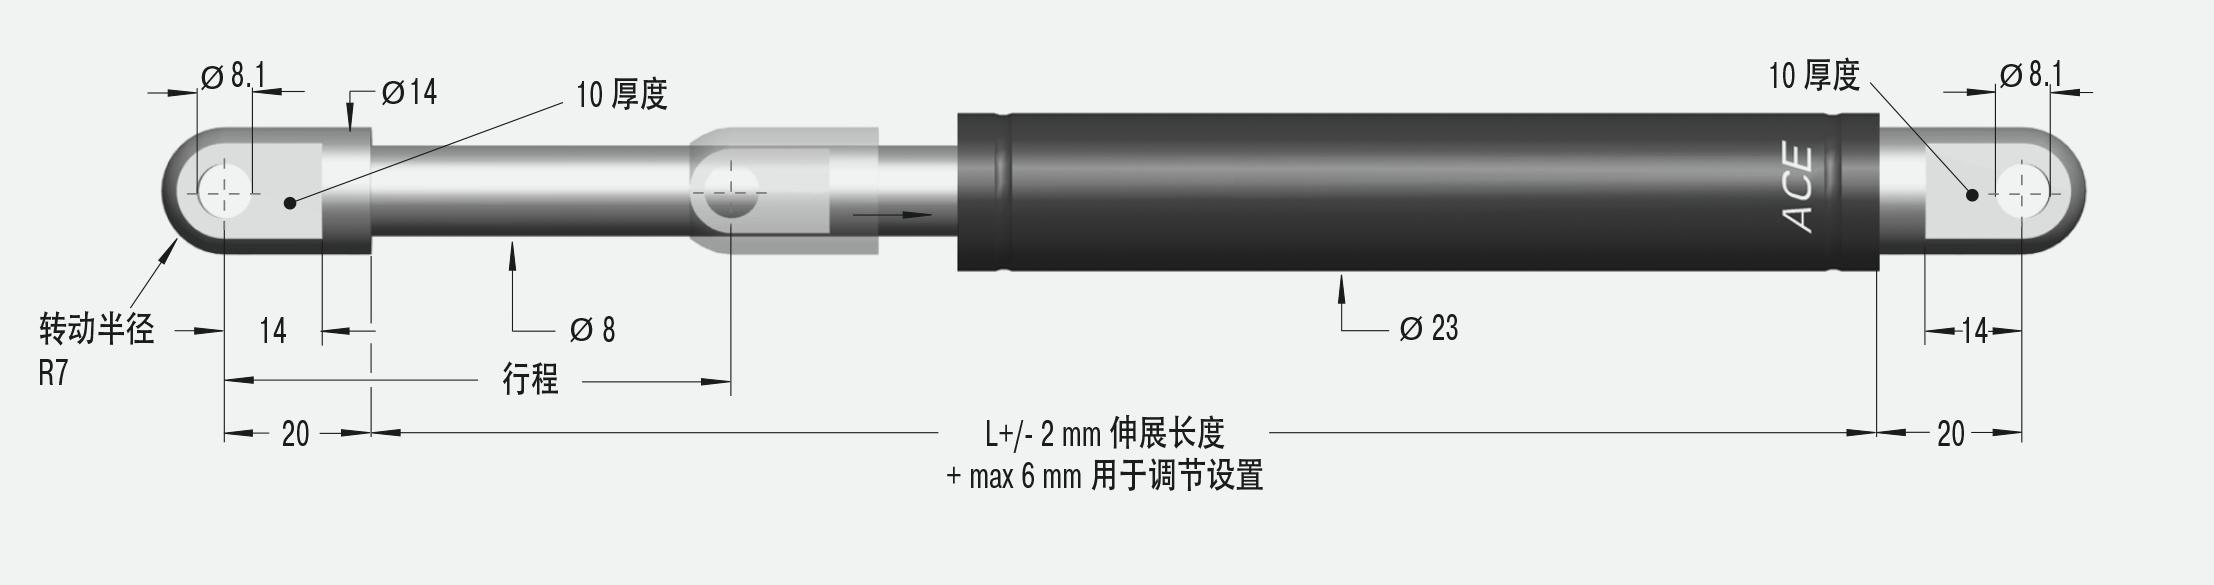 HB-22-50